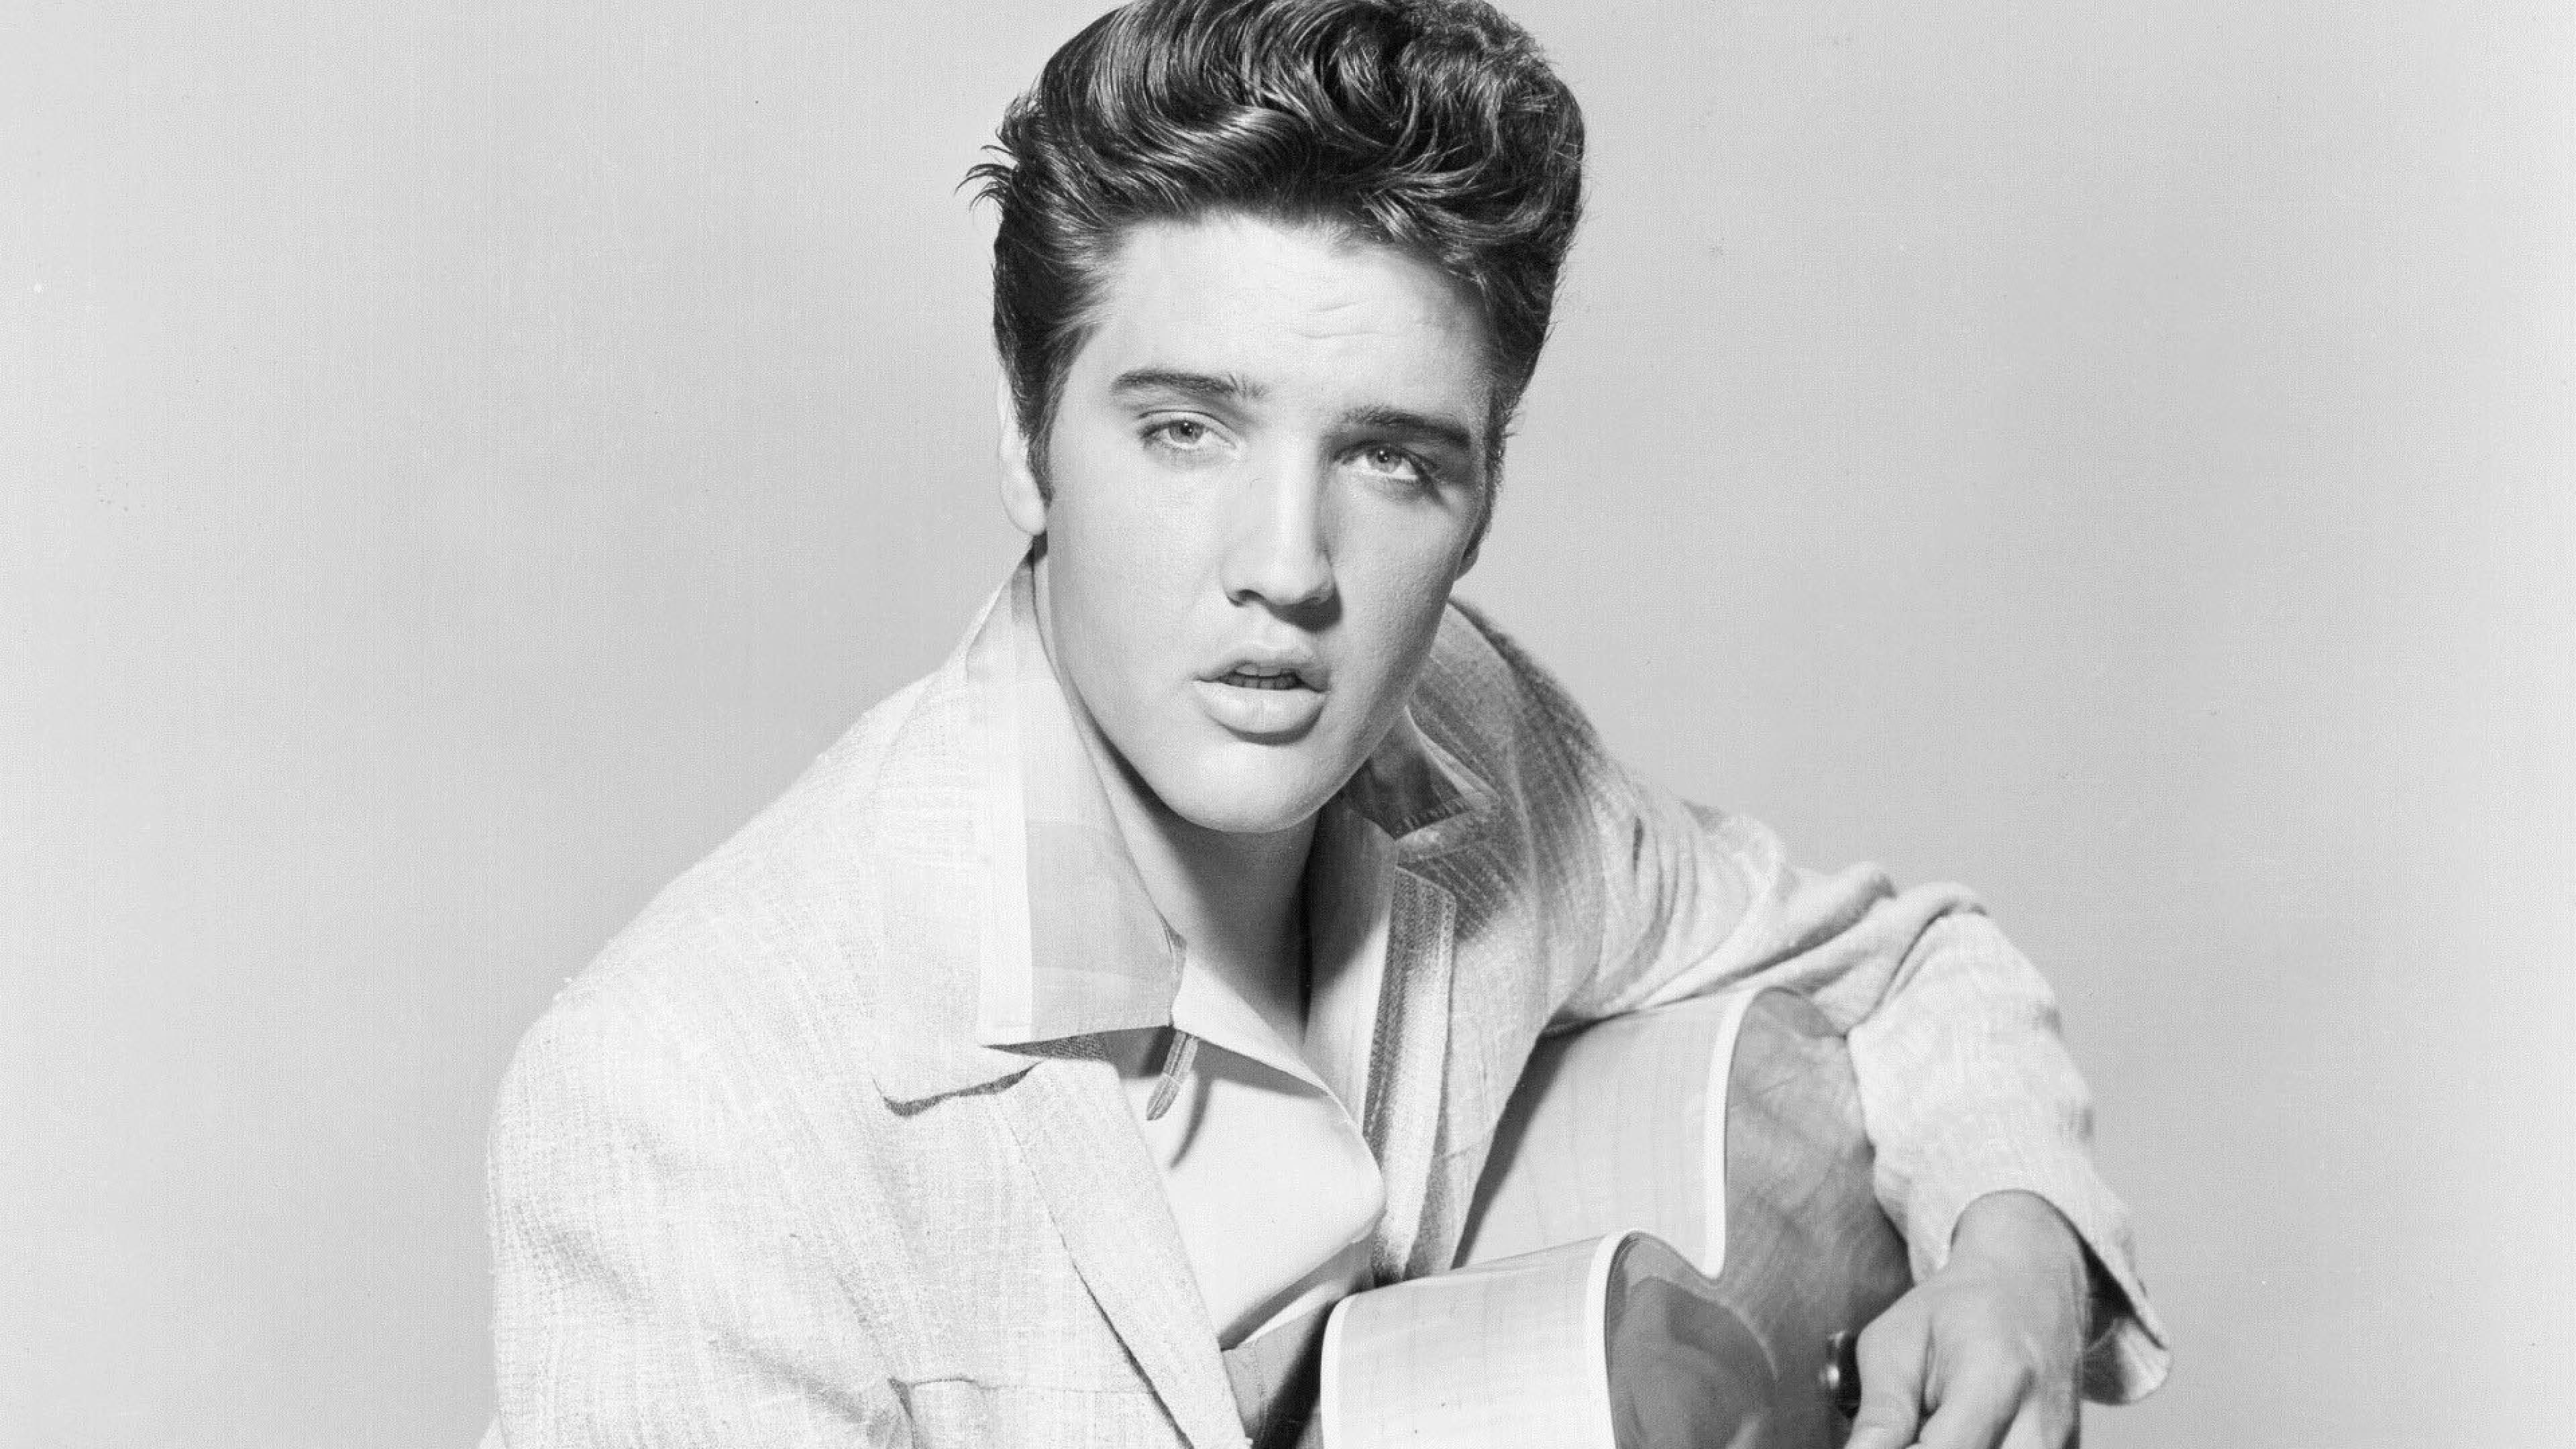 disgrace coetzee essay questions Elvis Essay Research Paper Elvis Presley ha